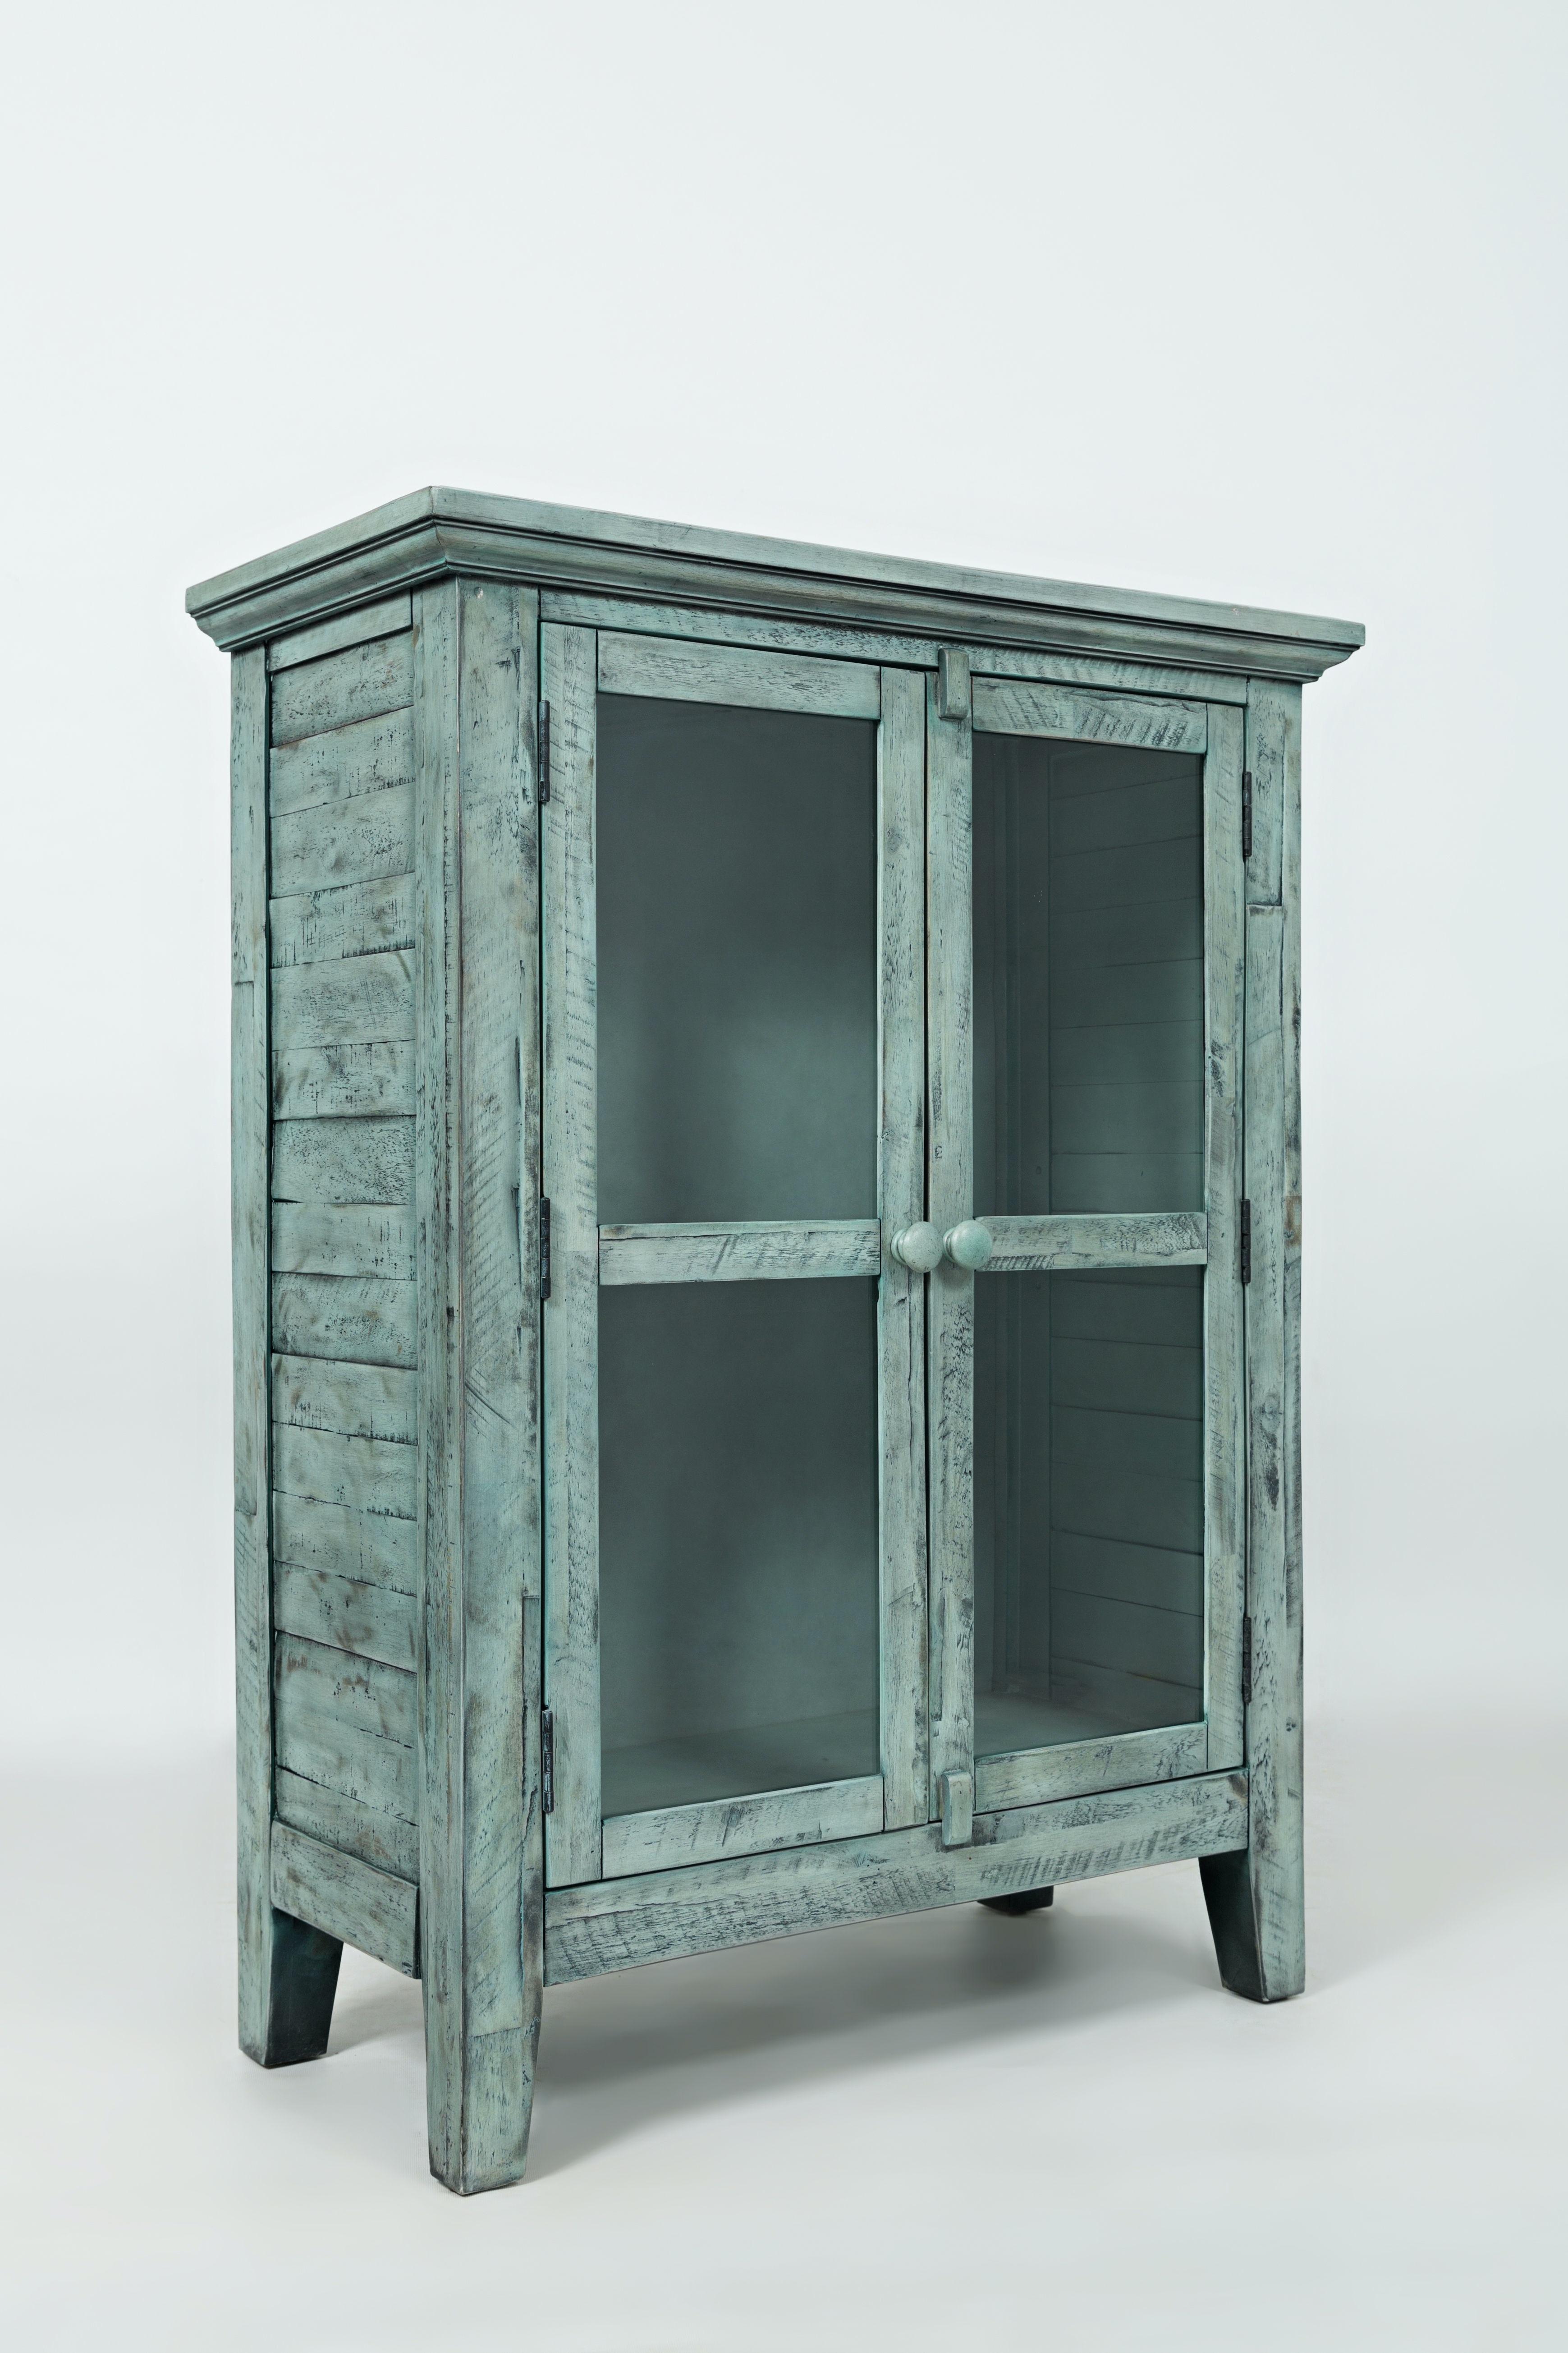 Charmant Jofran Living Room Two Door Accent Cabinet 1615 32   Kiser Furniture    Abingdon, VA